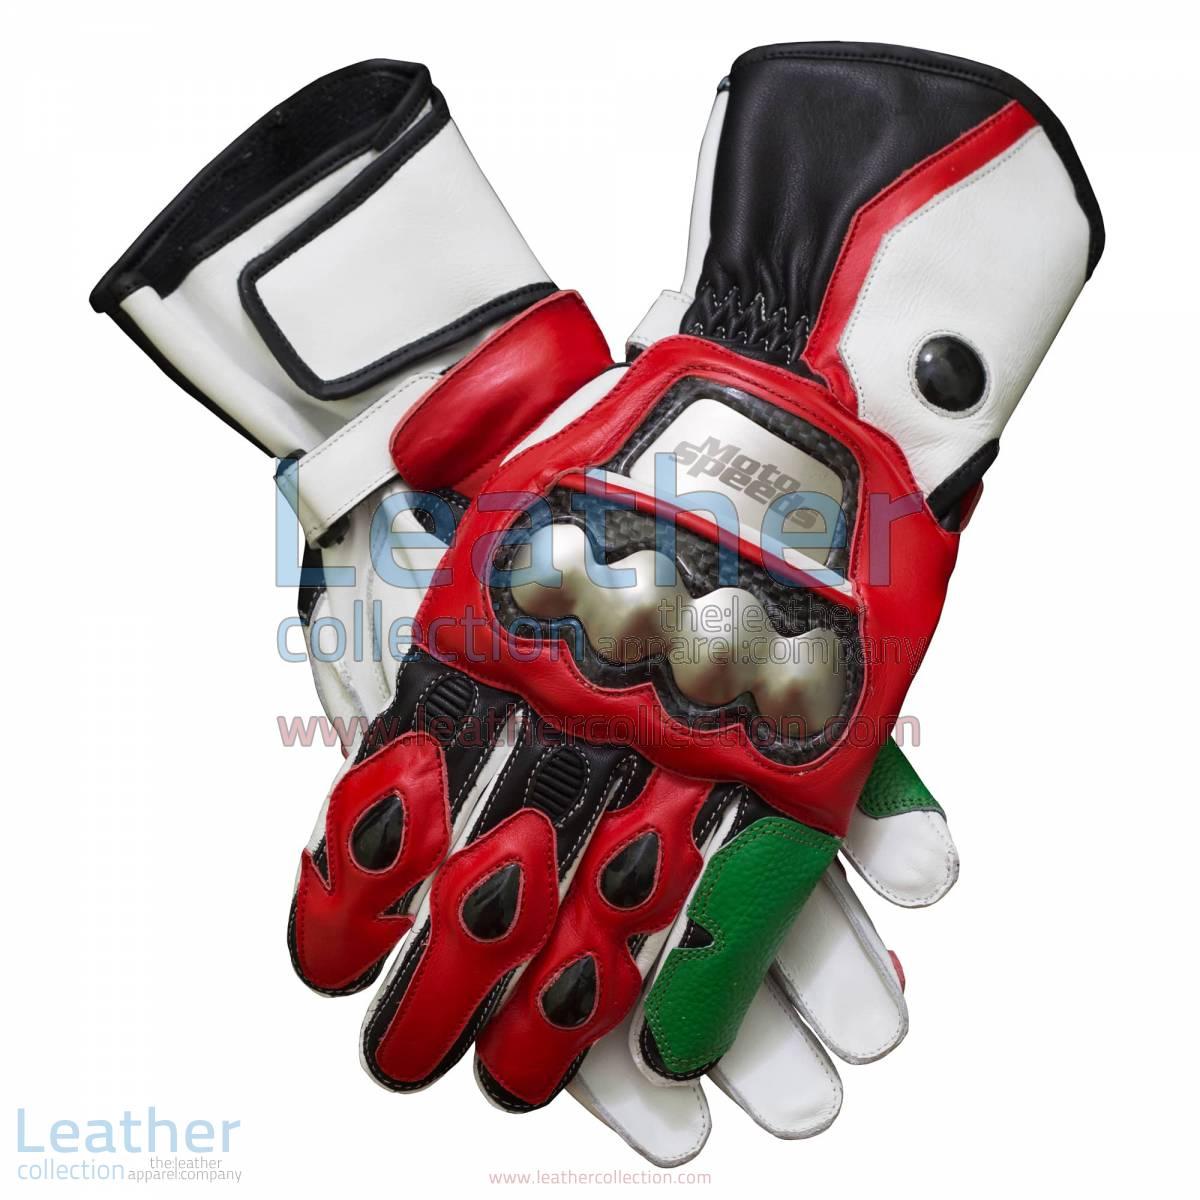 Tom Sykes Kawasaki 2015 MotoGP Gloves | kawasaki gloves,motogp gloves